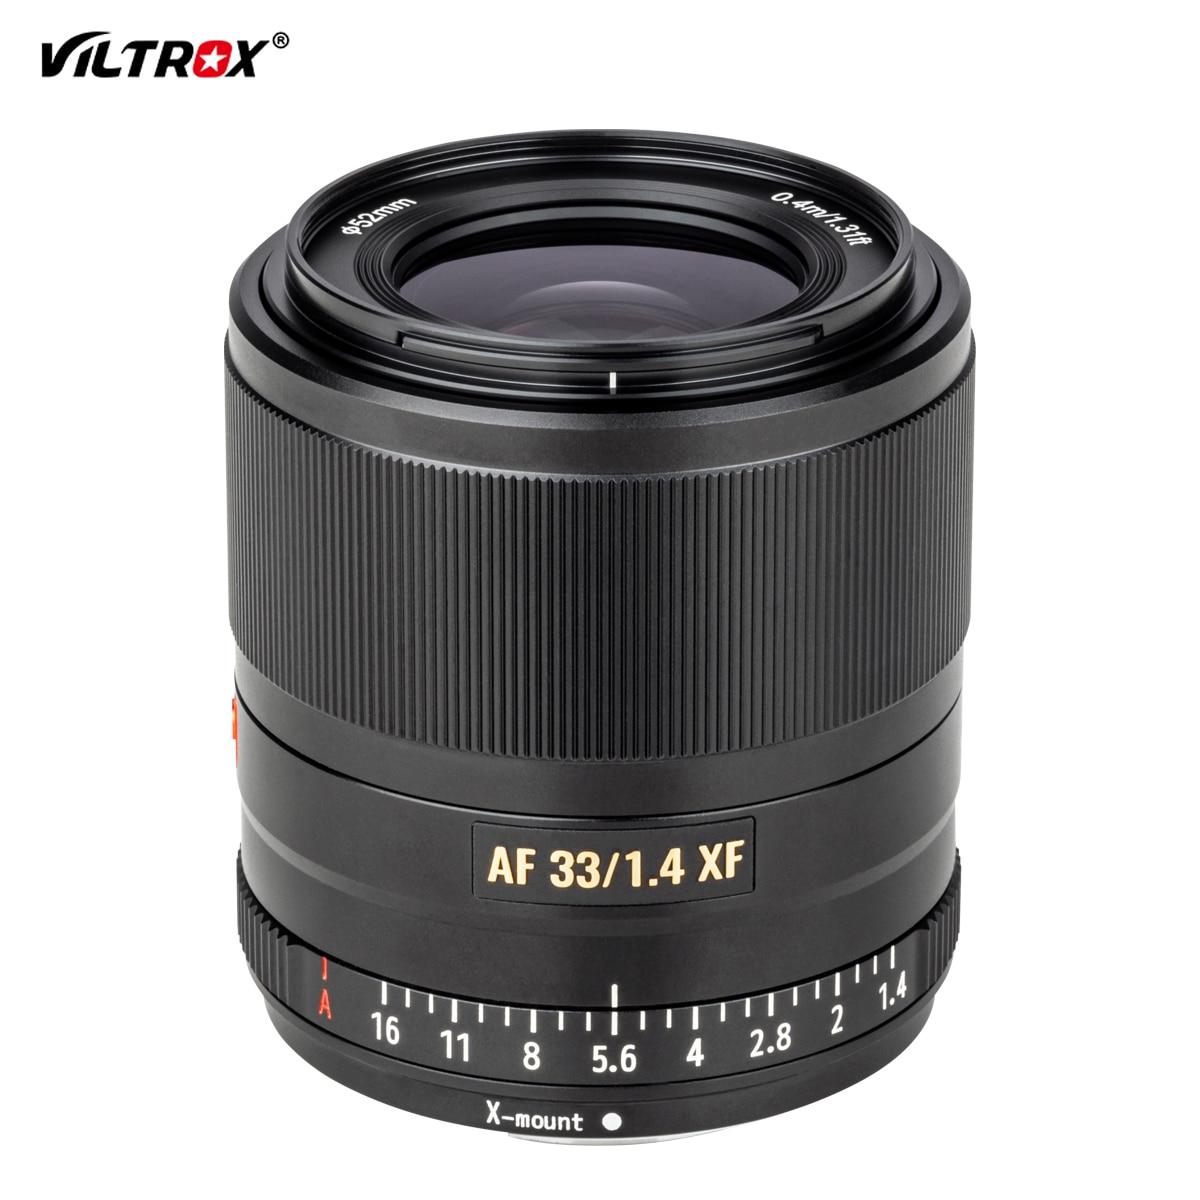 VILTROX AF 33/1.4 XF 33mm F1.4 lente de enfoque fijo automático para cámara Fujifilm FUJI x-mount X-T3 X-T2 X-H1 X20 X-T30 X-T20